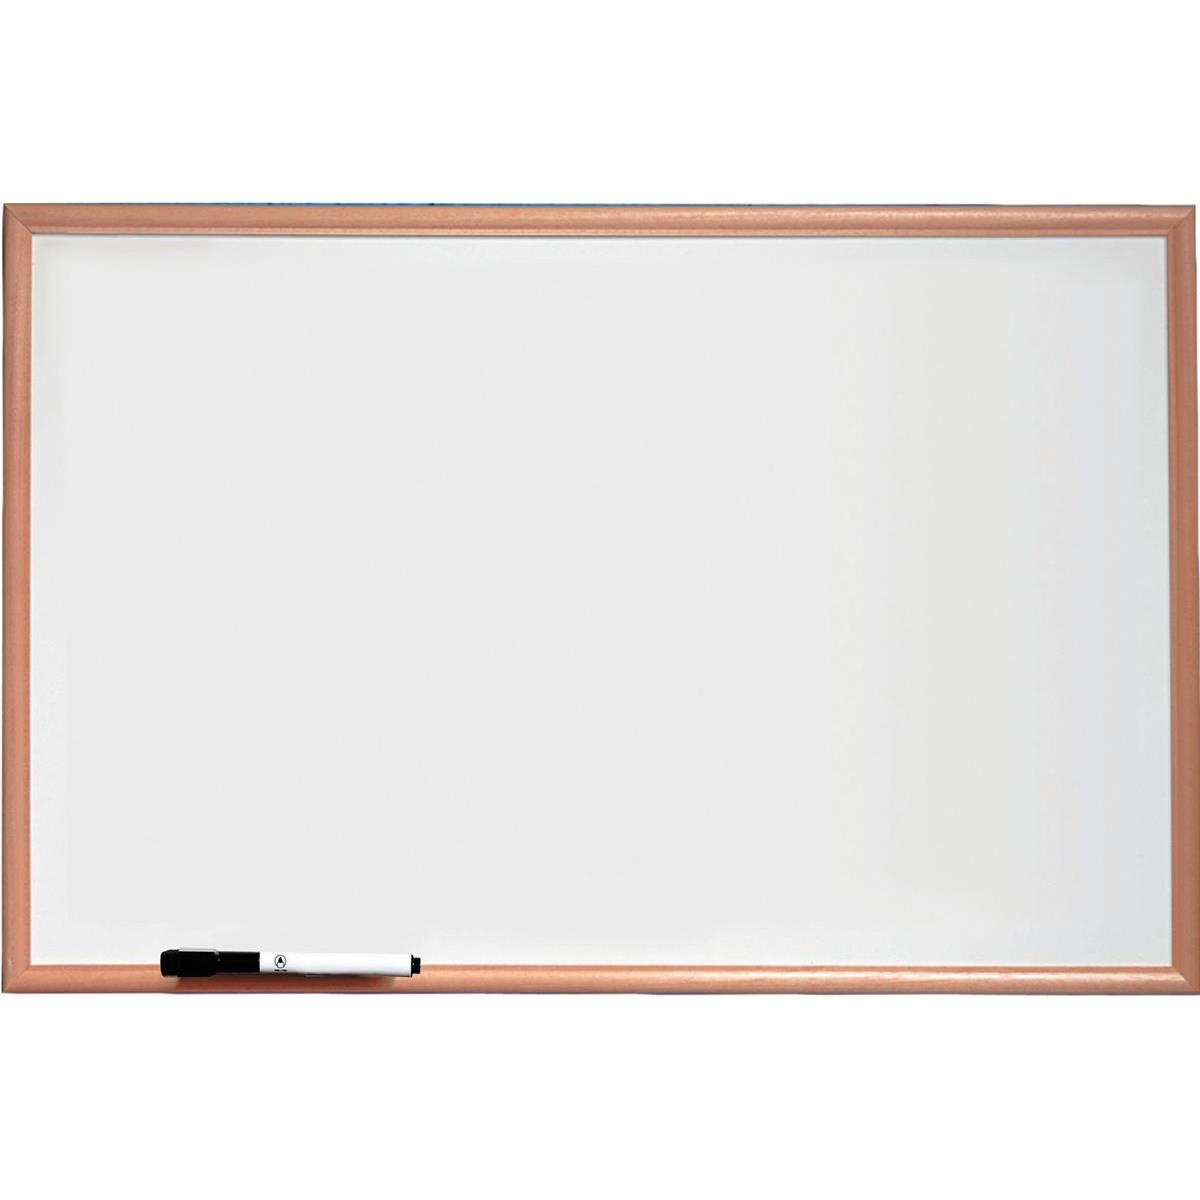 Nobo Basic Whiteboard Melamine Surface Non-magnetic Pine Trim W900xH600mm White Ref 1905200